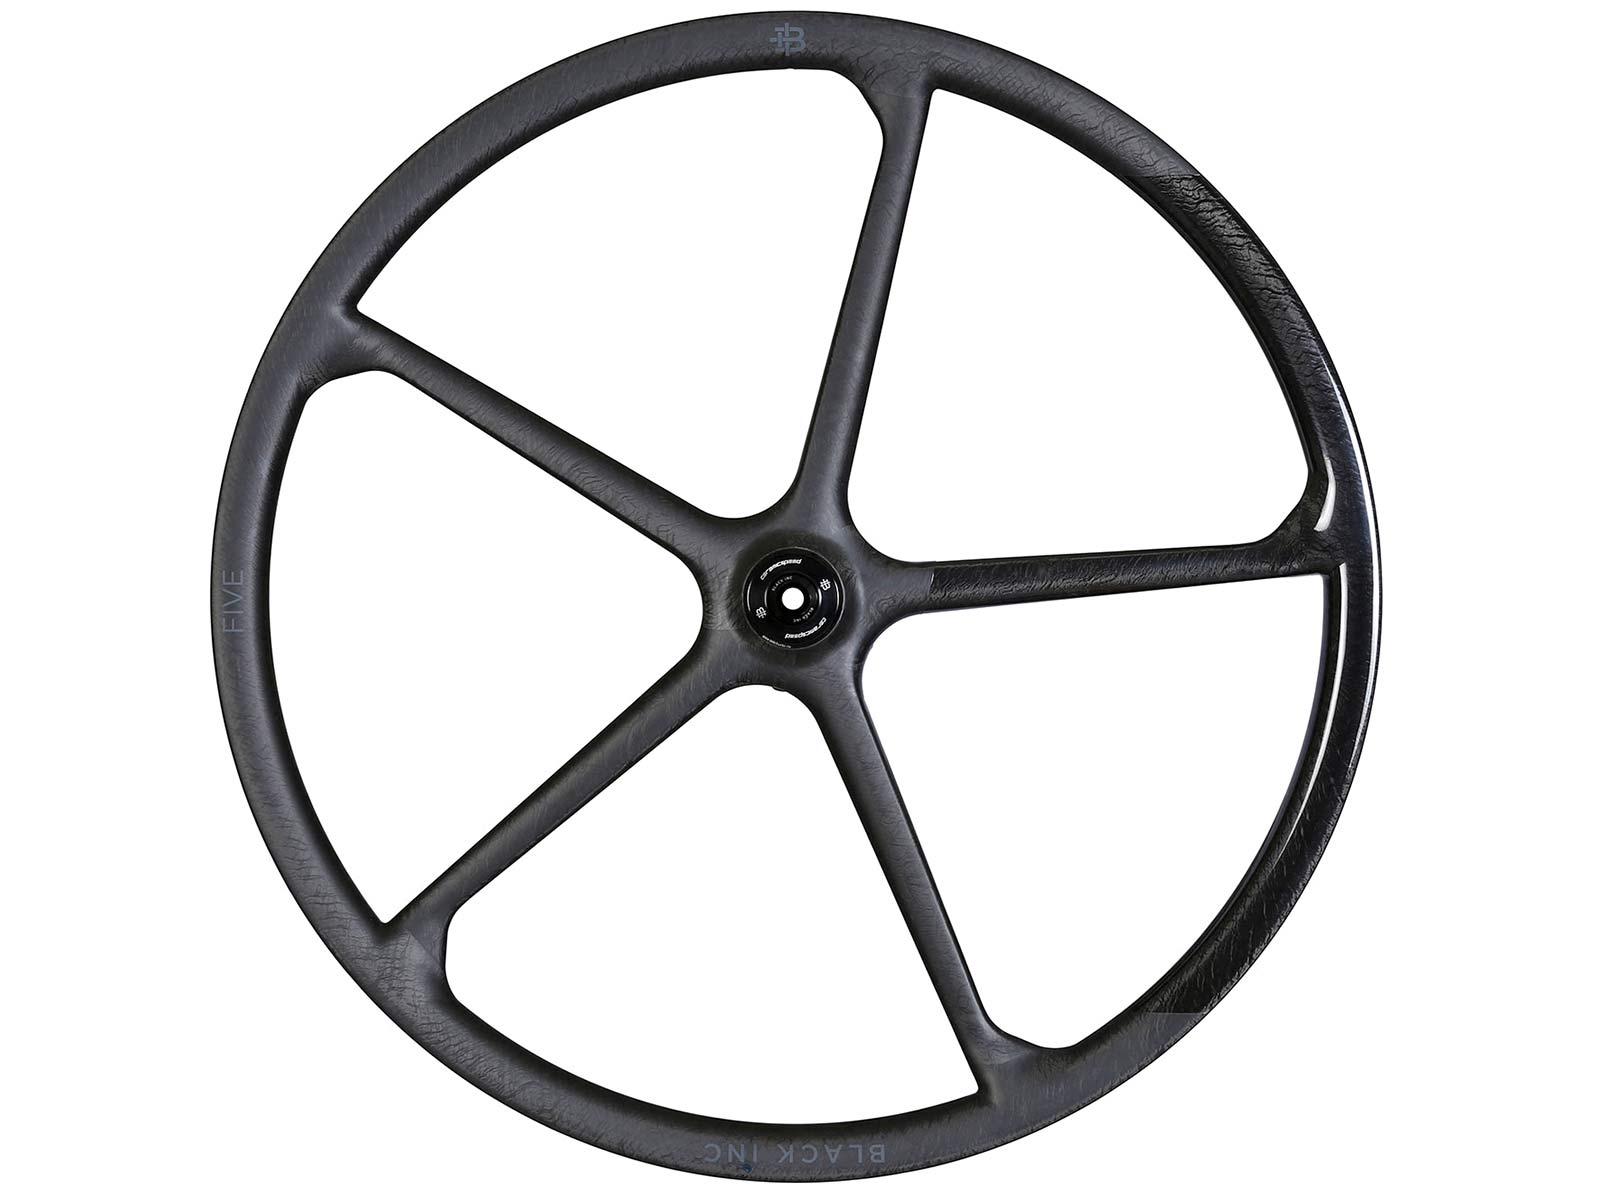 Black Inc FIVE aero carbon 5-spoke tubeless disc brake road bike wheels,side